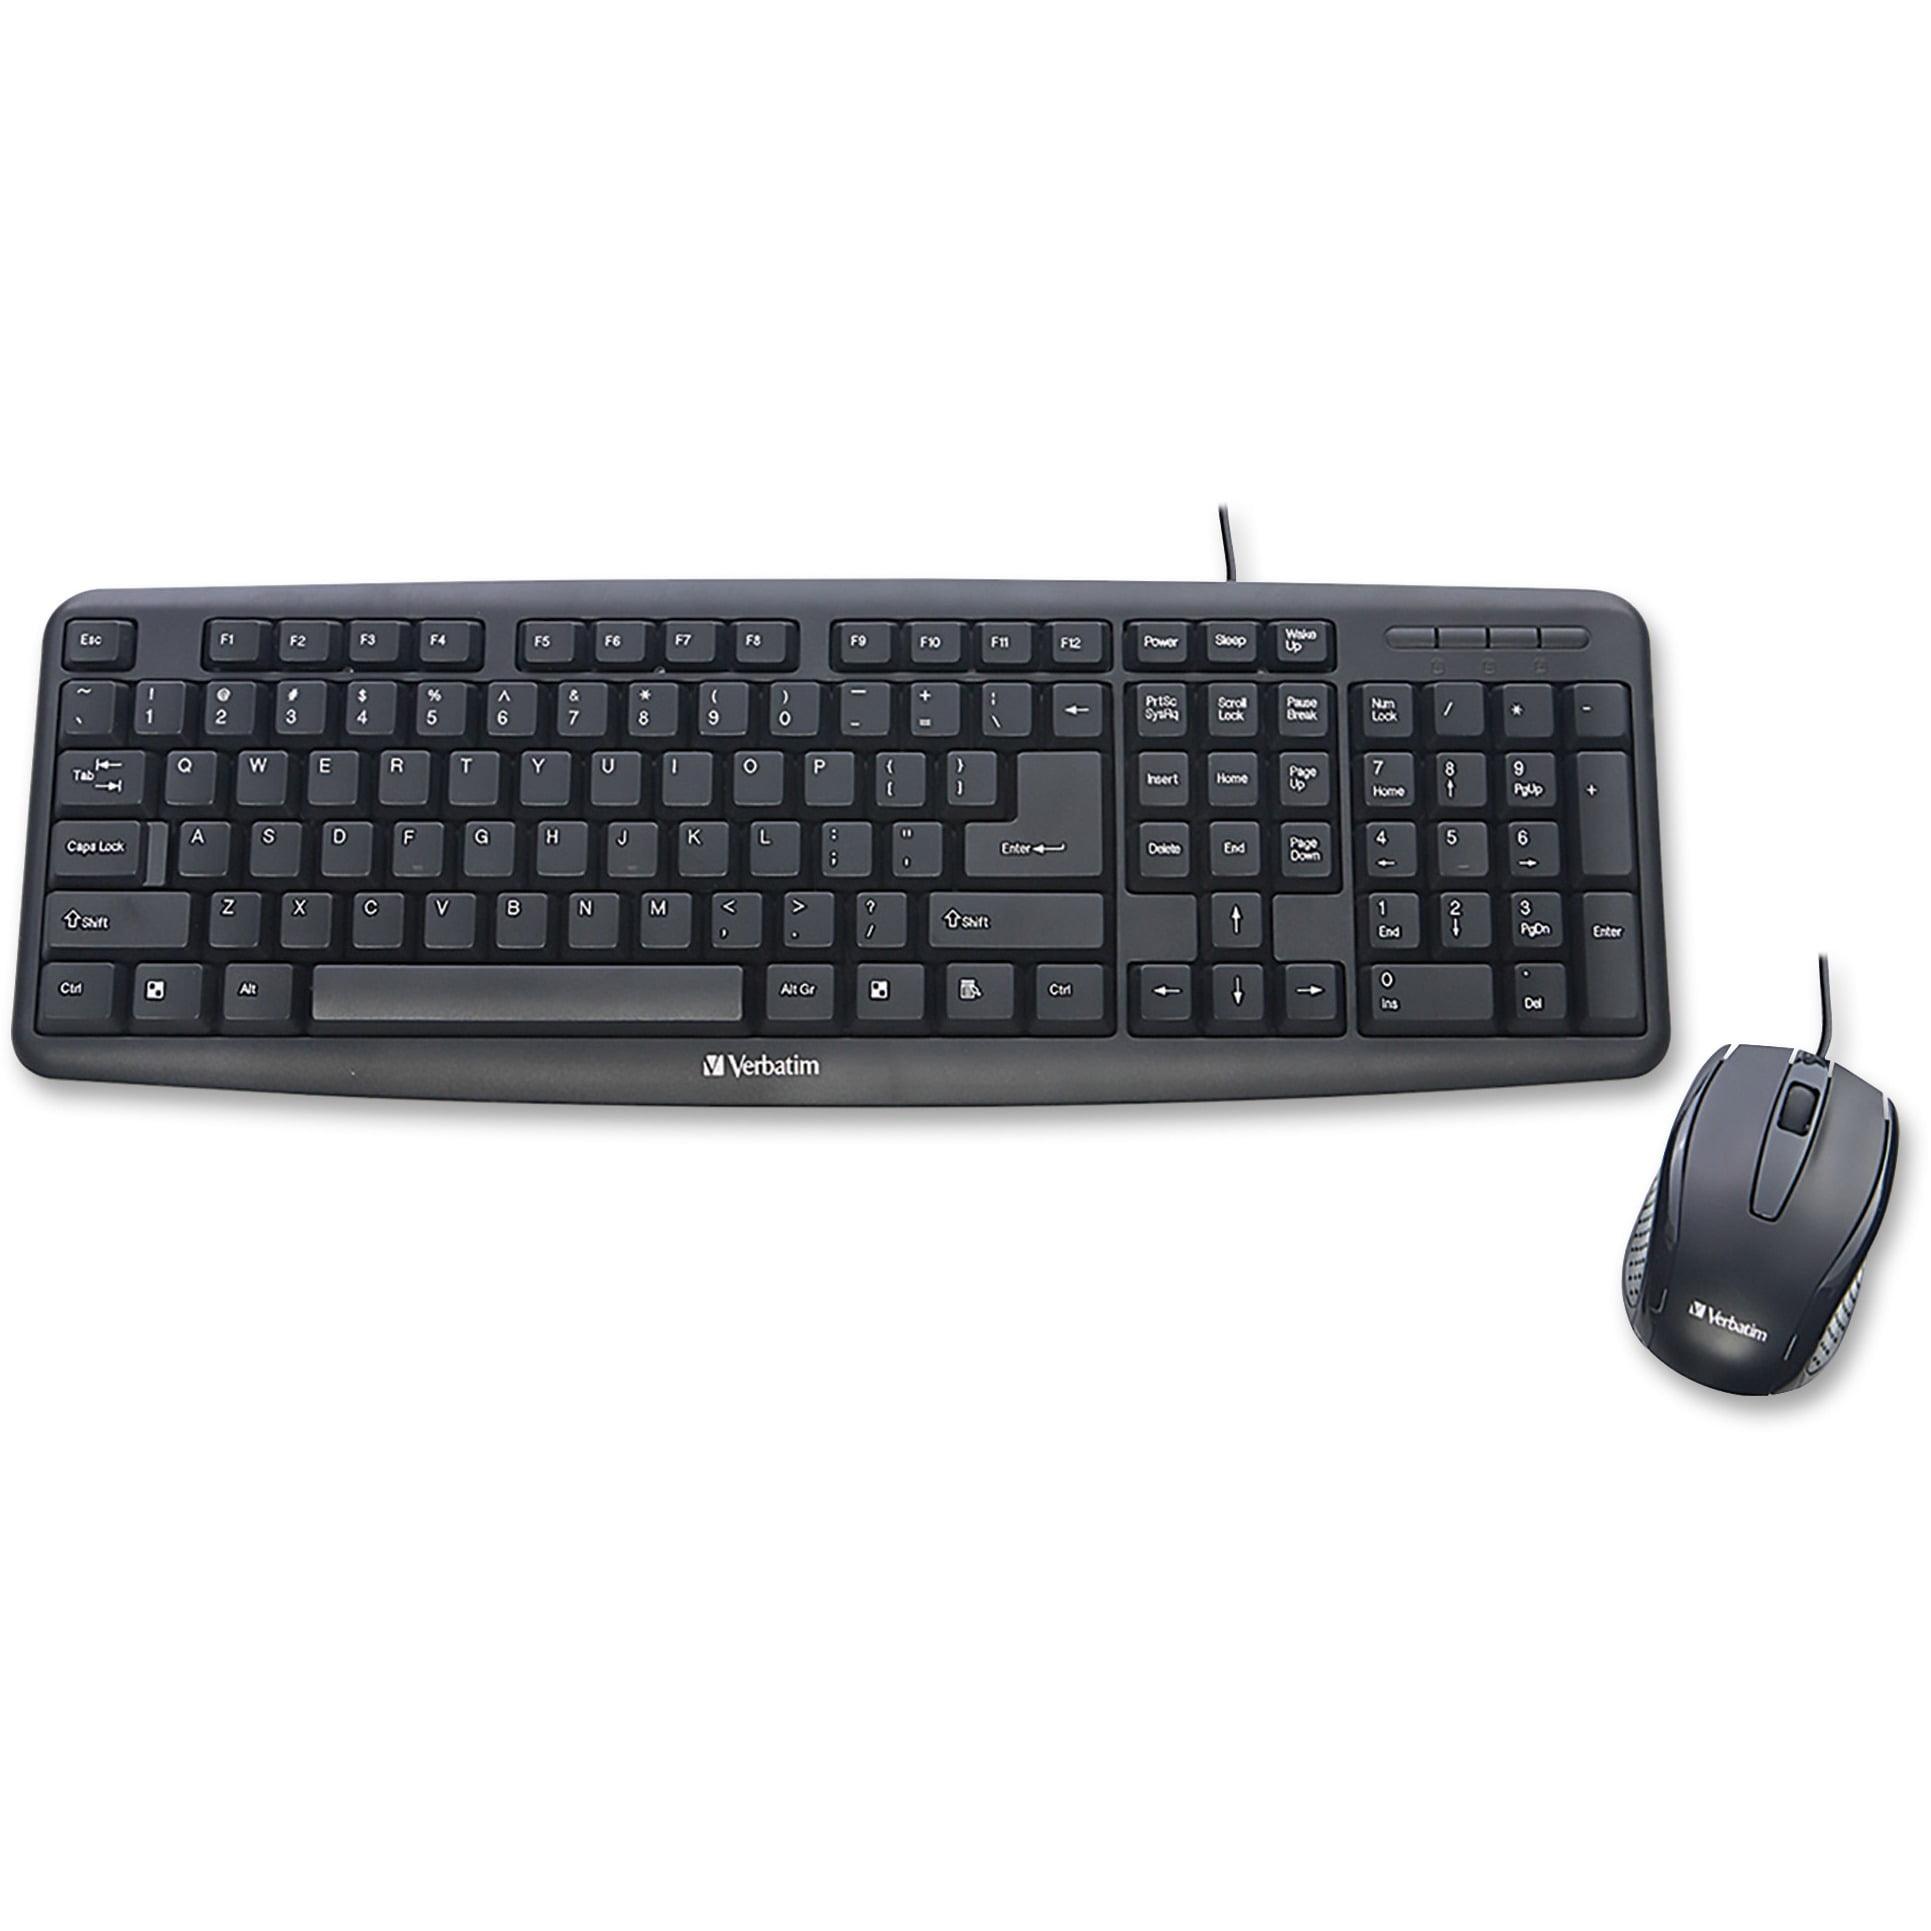 Verbatim, VER99202, Slimline Corded USB Keyboard and Mouse-Black, 1